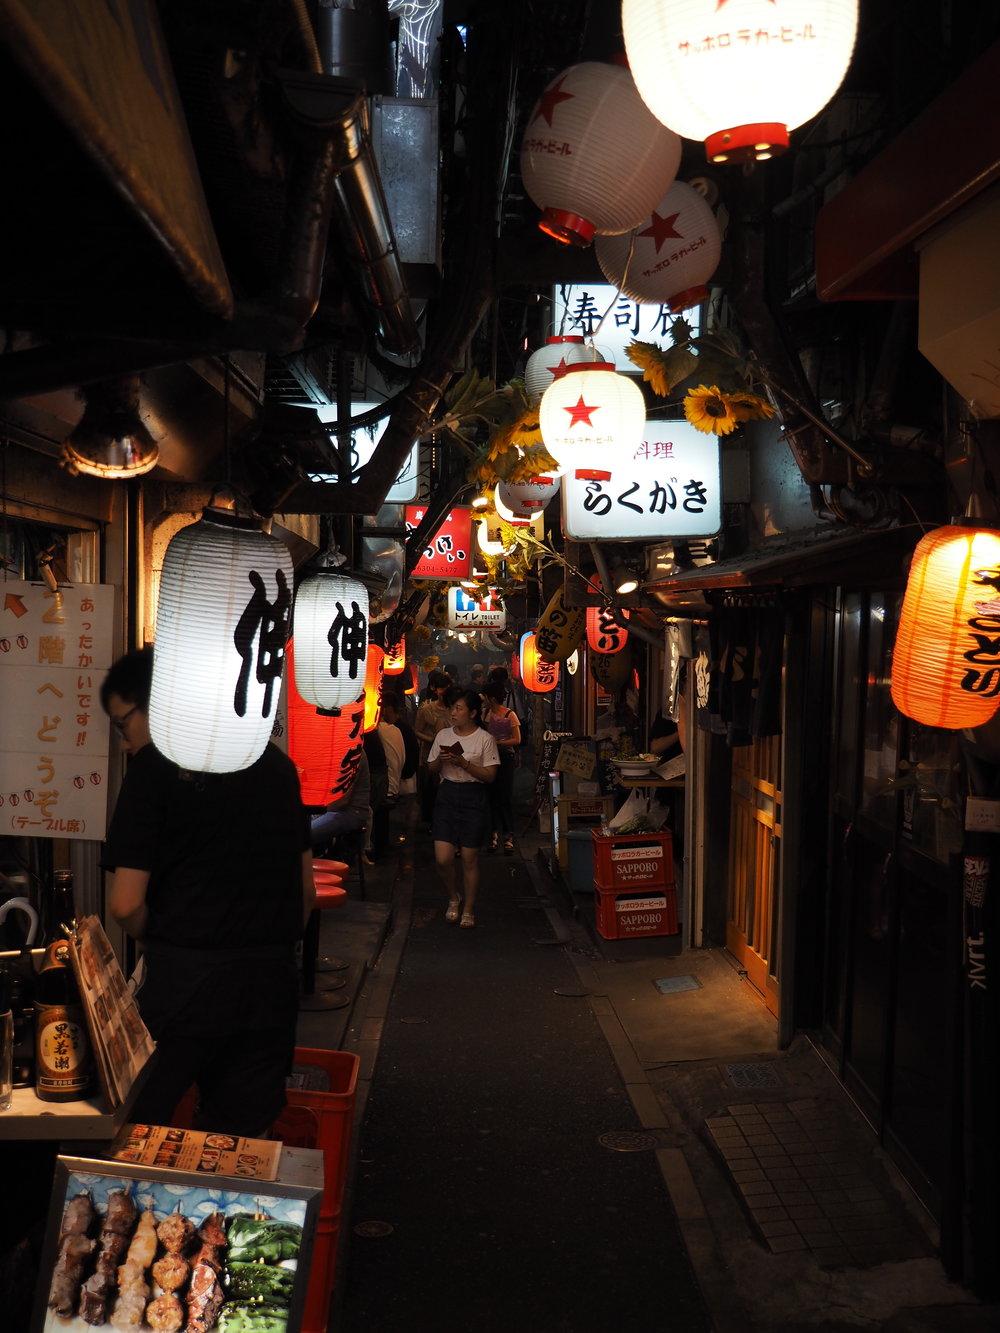 Alley in Shinjuku, Tokyo